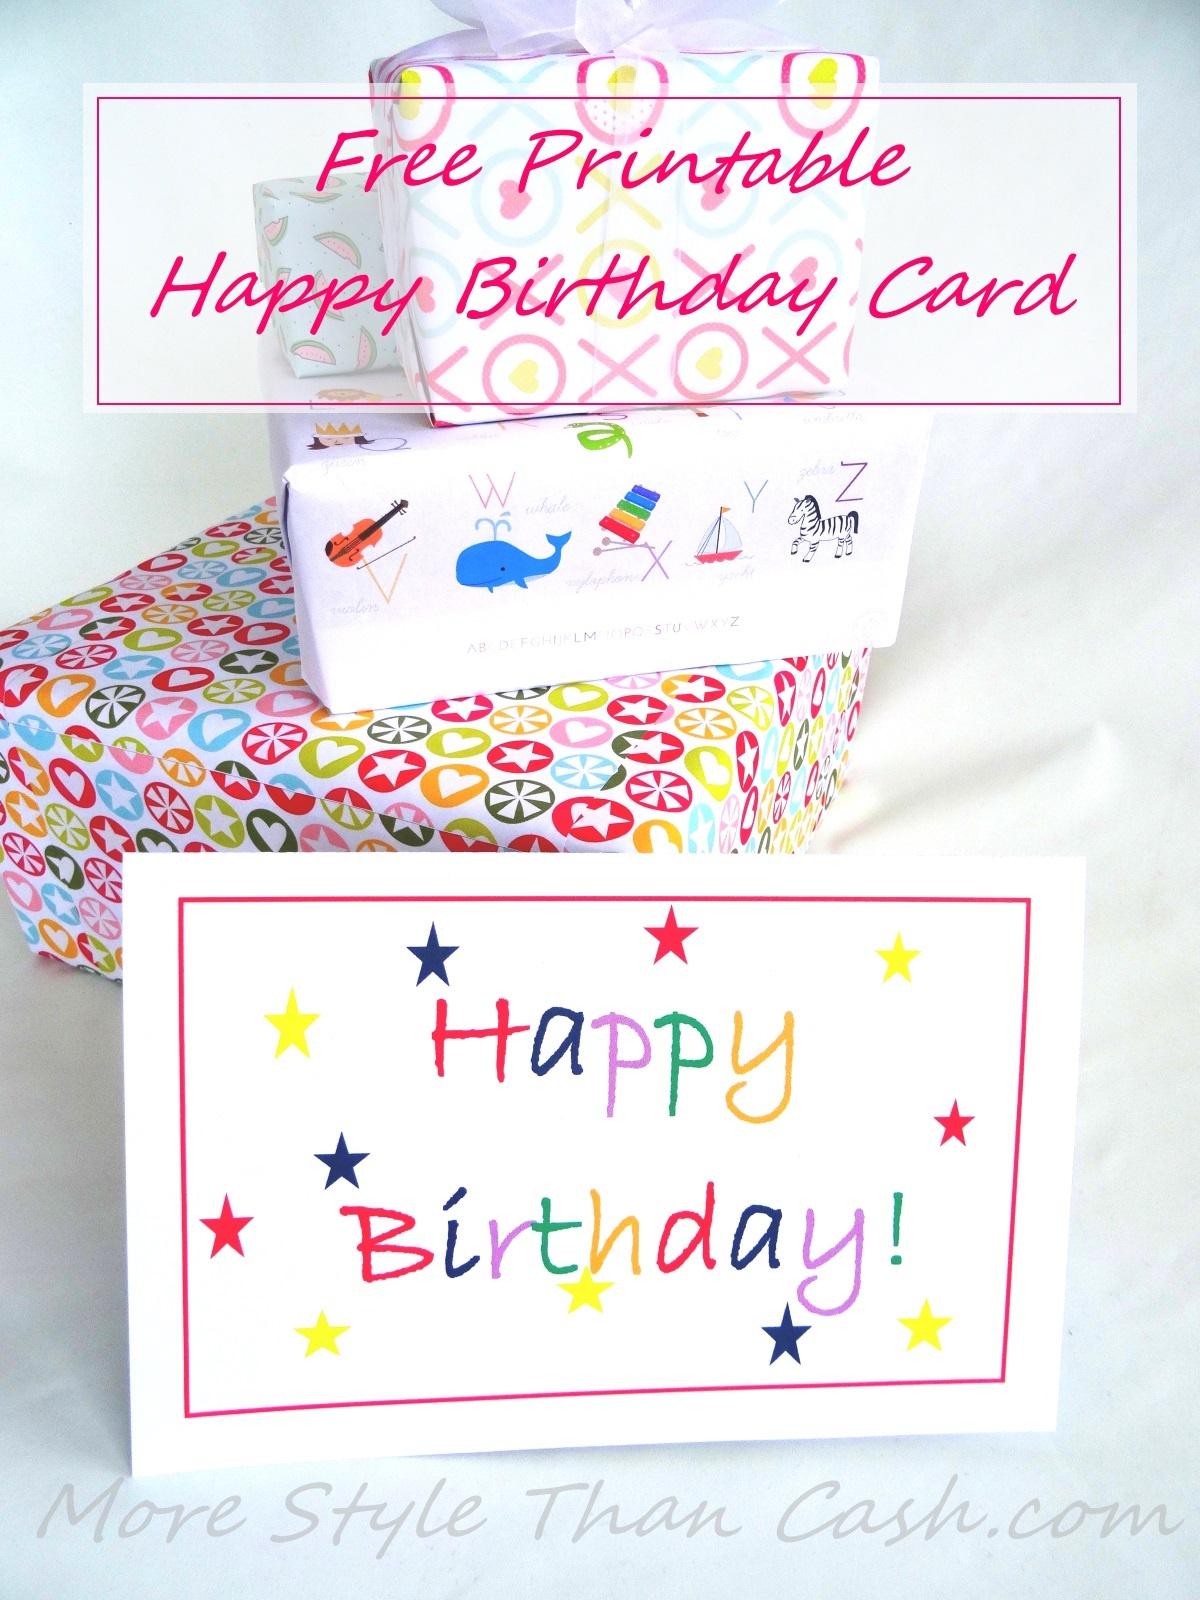 Free Printable Birthday Card - Free Printable Happy Birthday Cards